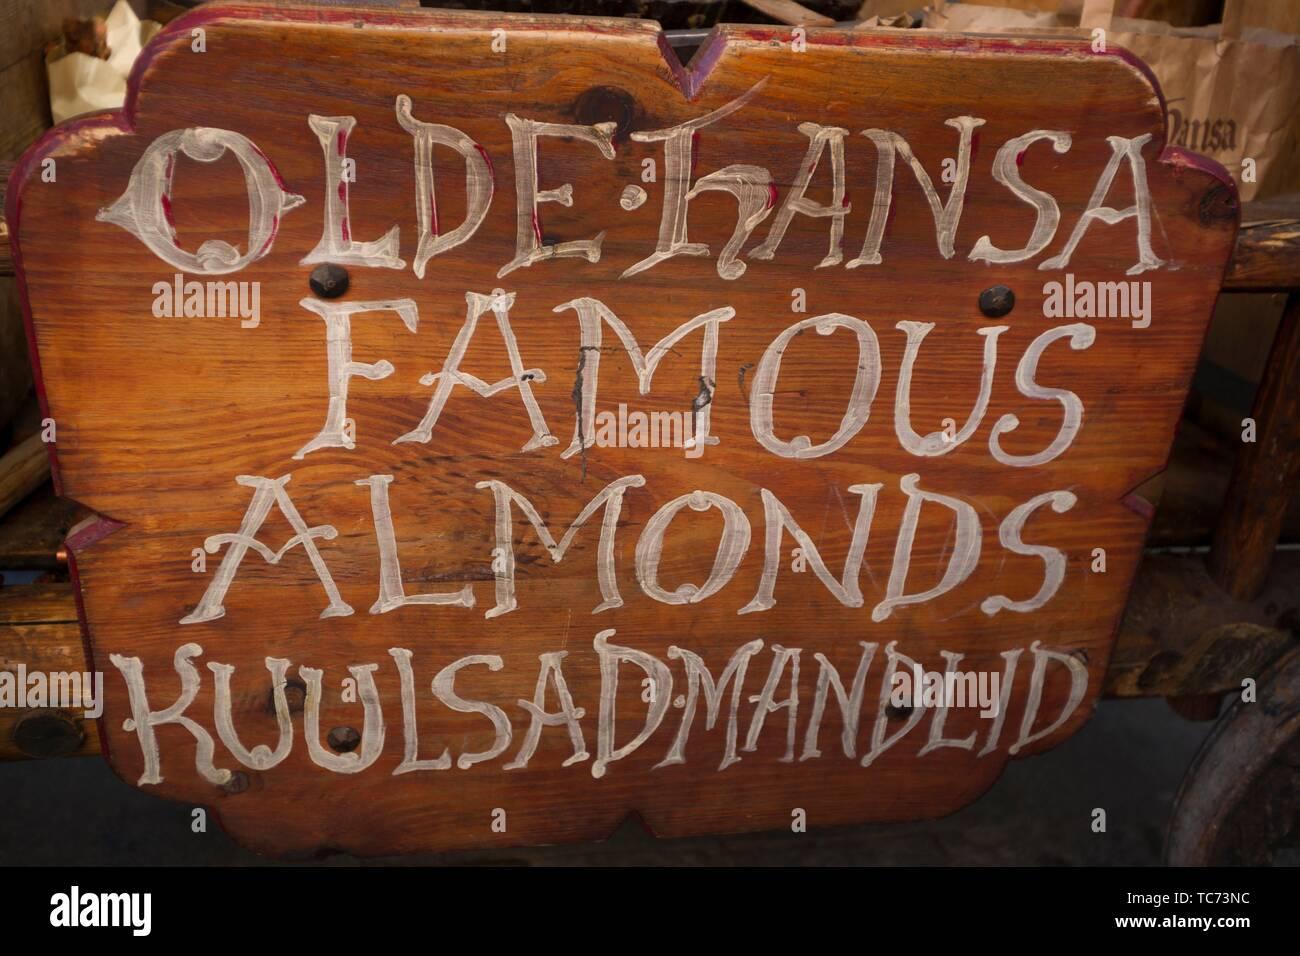 Sign for Olde Hansa sweet almonds. Tallinn Town Hall Square (Raekoja Plats). Old Town, Tallinn, Estonia, Baltic States. - Stock Image